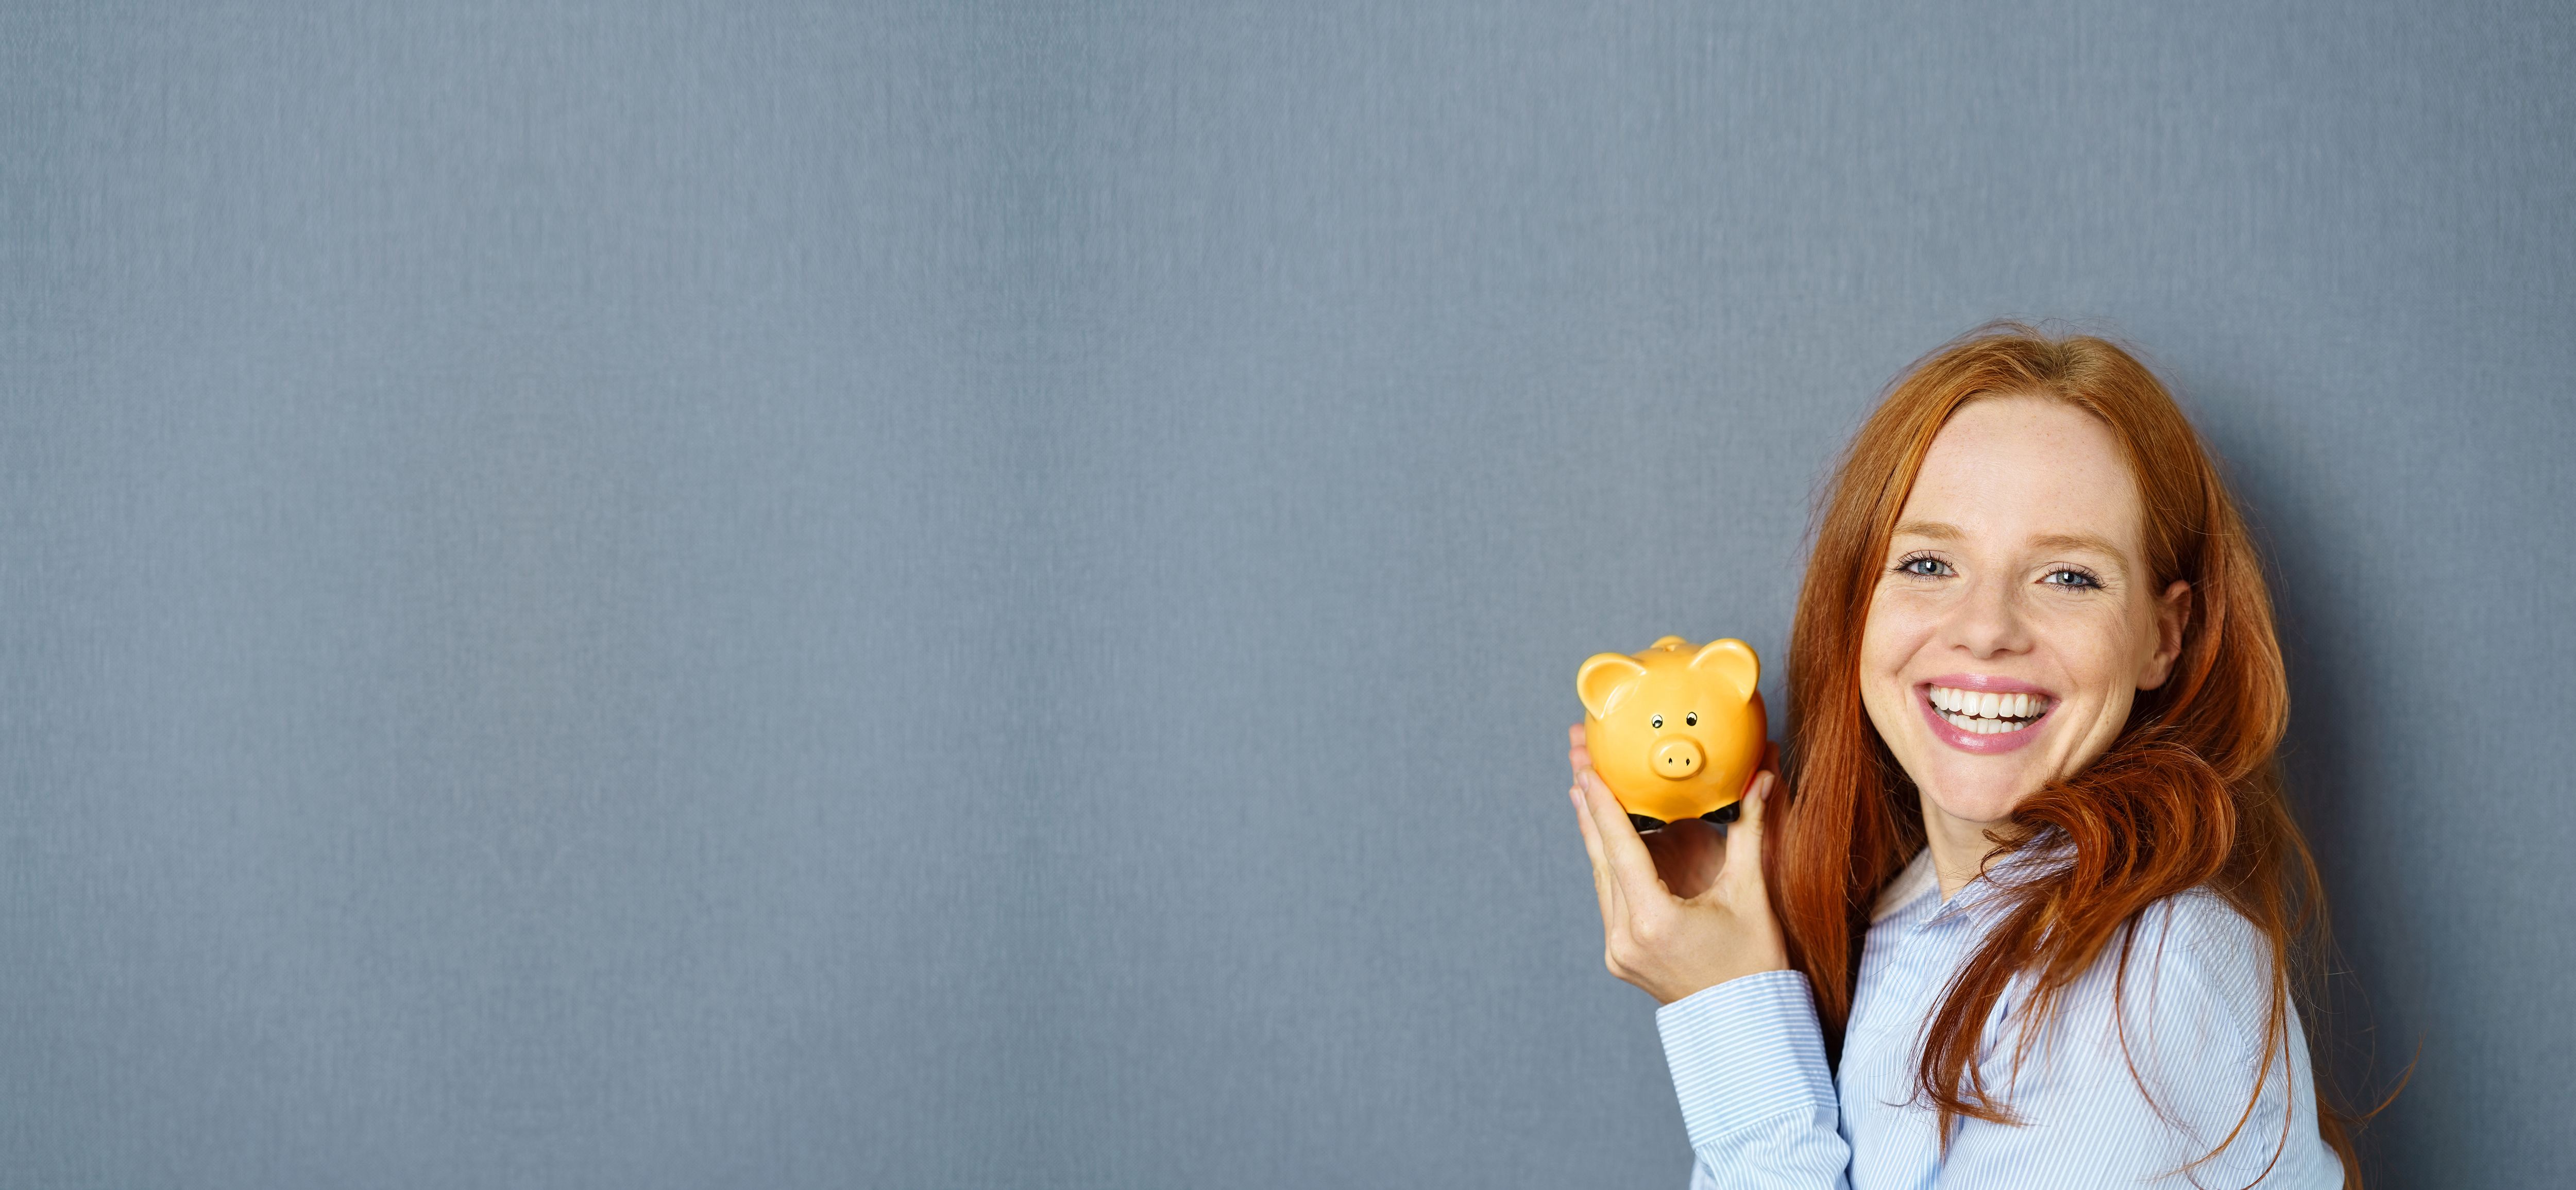 Aktionsbonus Energie - rothaarige Frau mit orangem Sparschwein